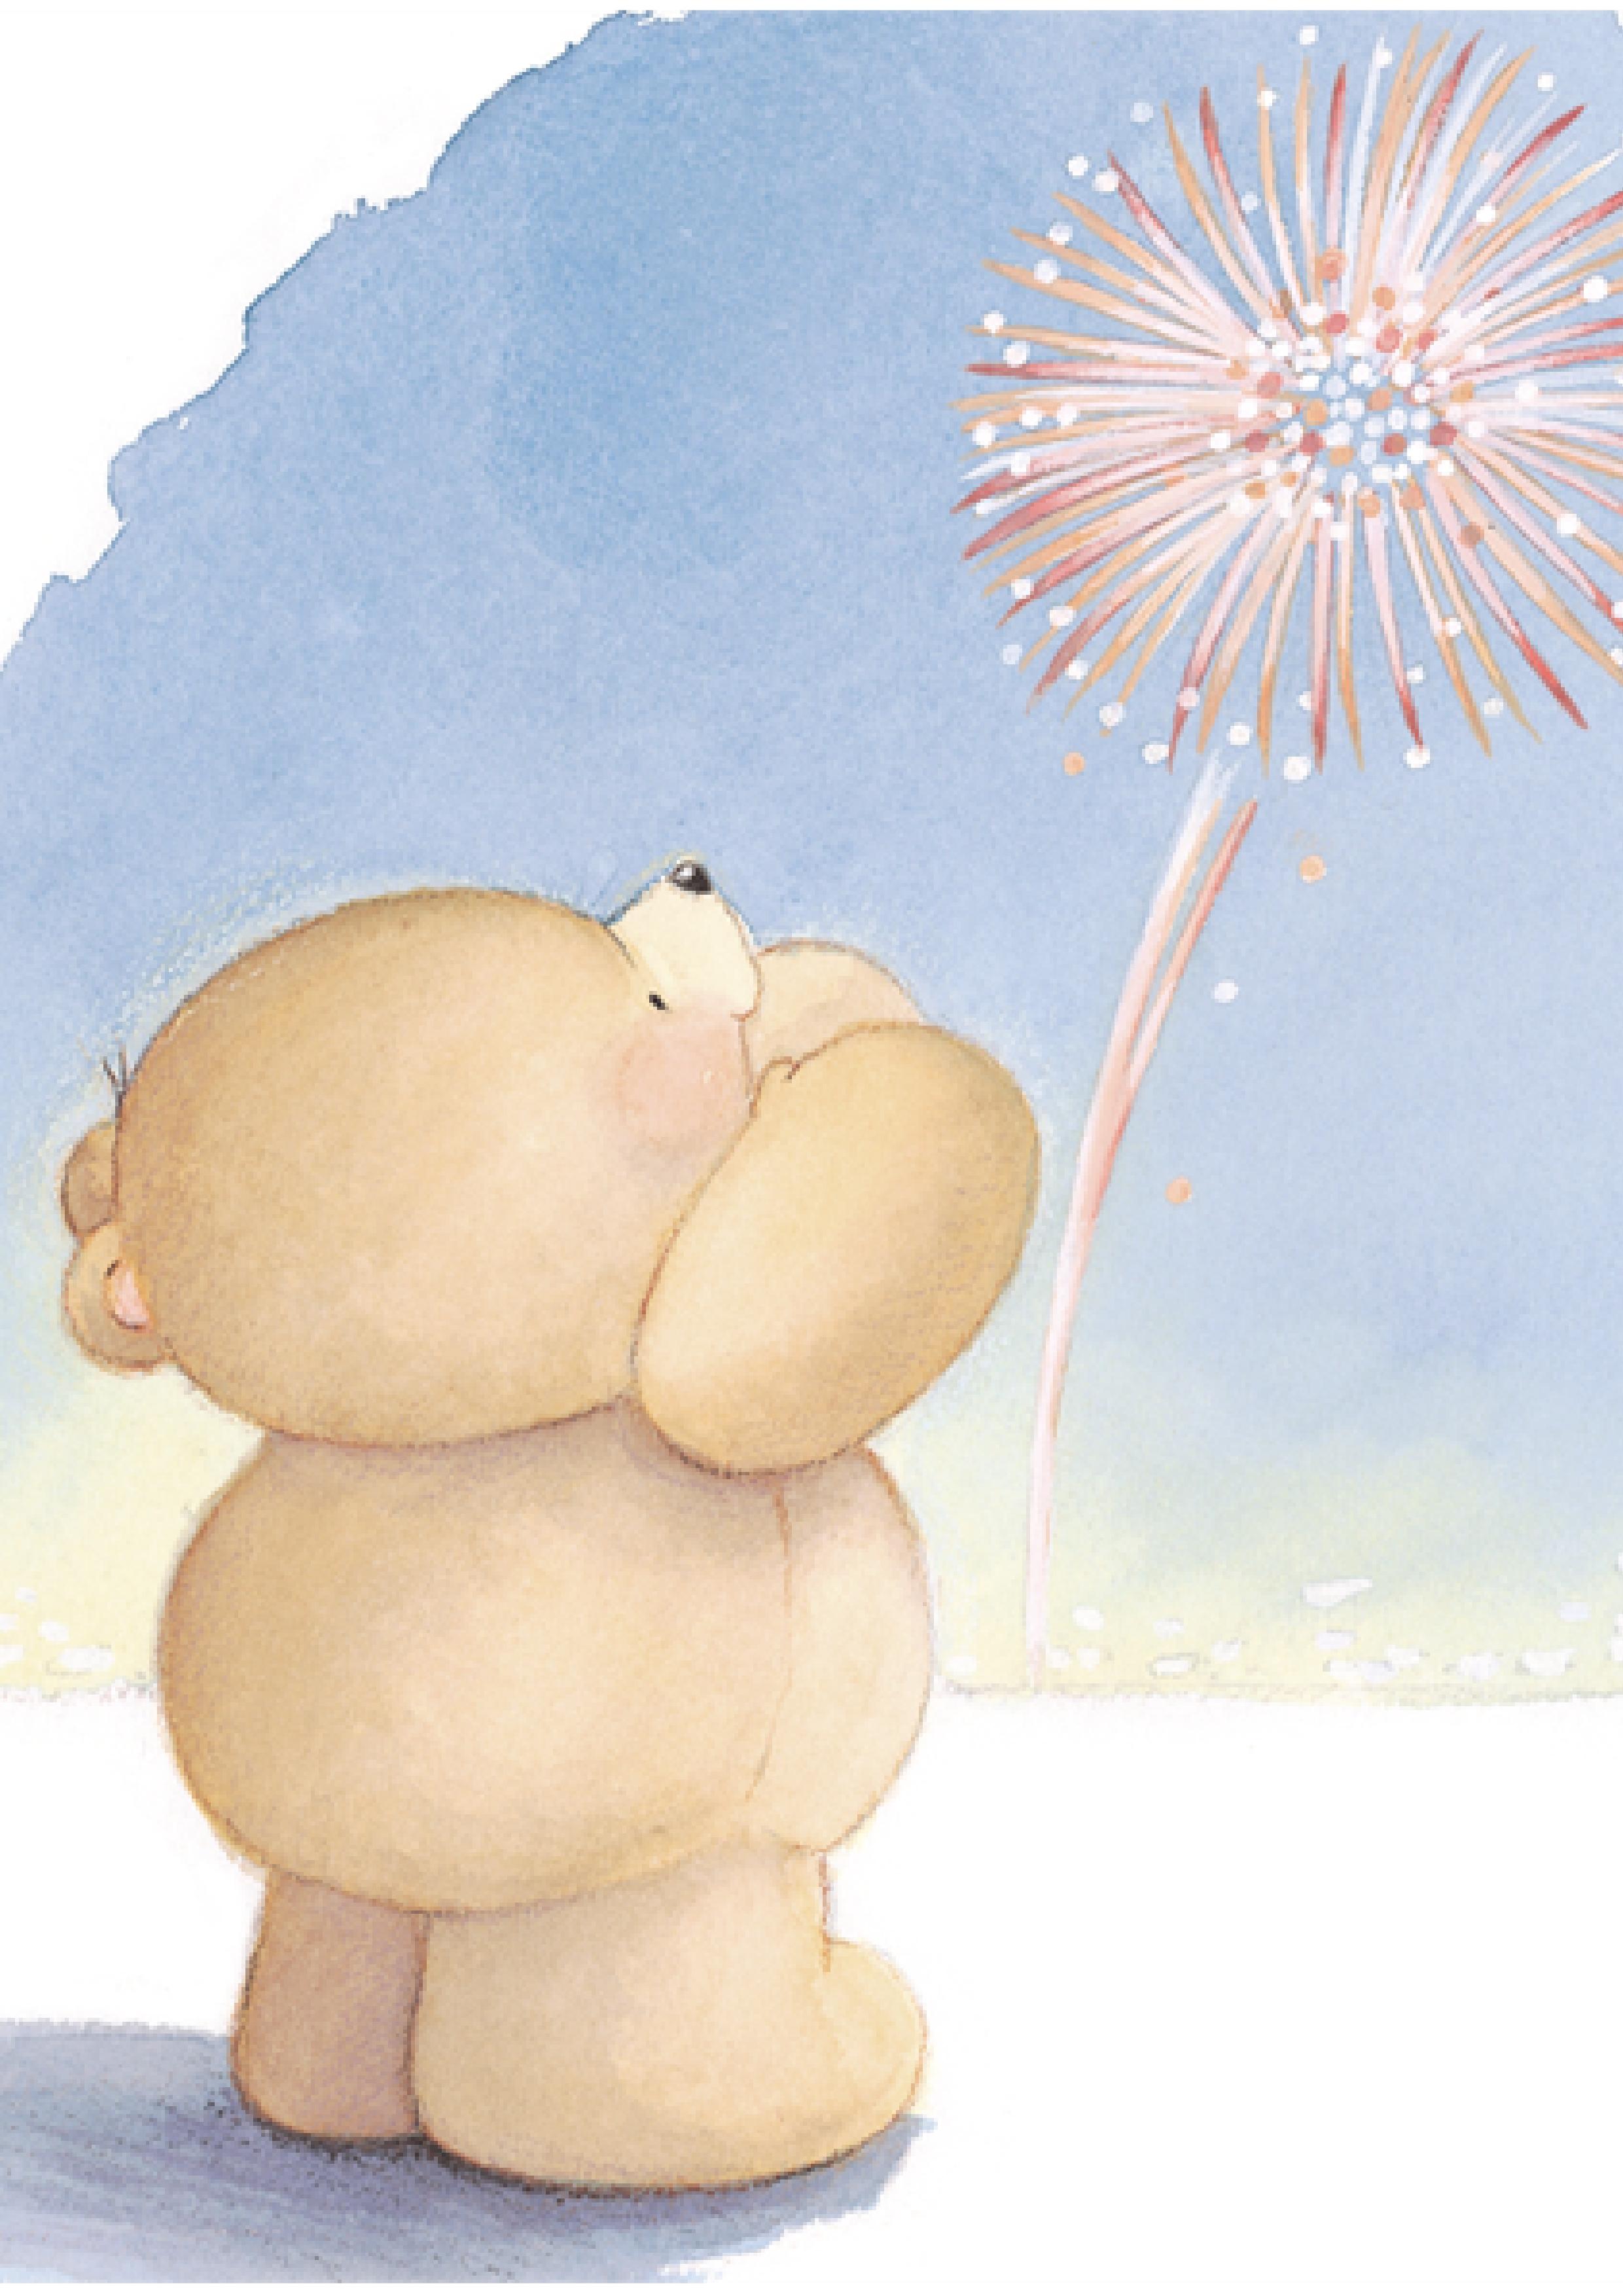 Cute Teddy Hd Wallpaper Download Forever Friends Bear Wallpaper Page 2 Of 3